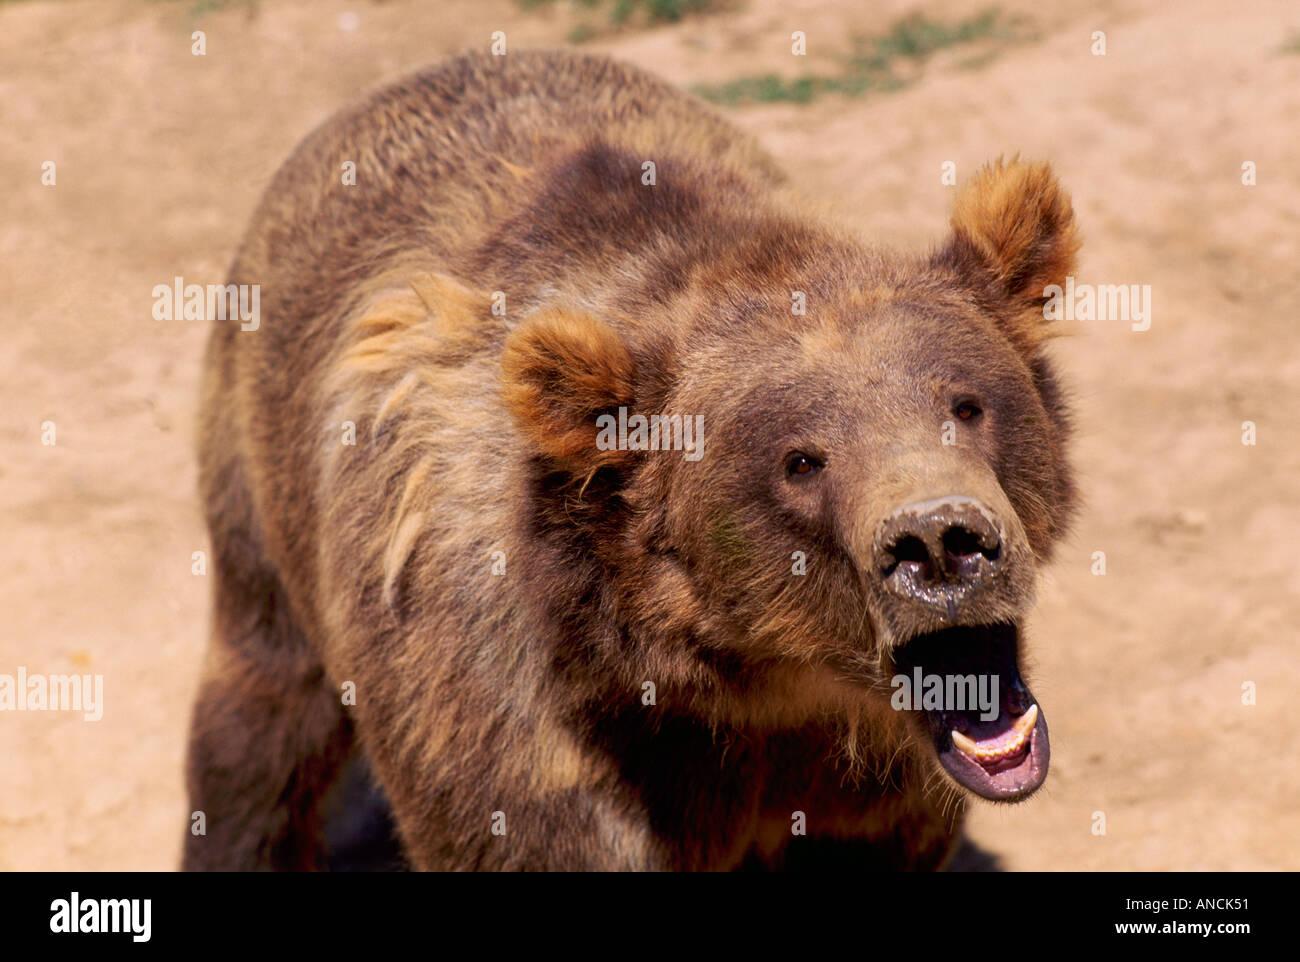 Kodiak Bear aka Alaskan Grizzly Bear and Alaska Brown Bear (Ursus arctos middendorffi) yawning - North American Stock Photo